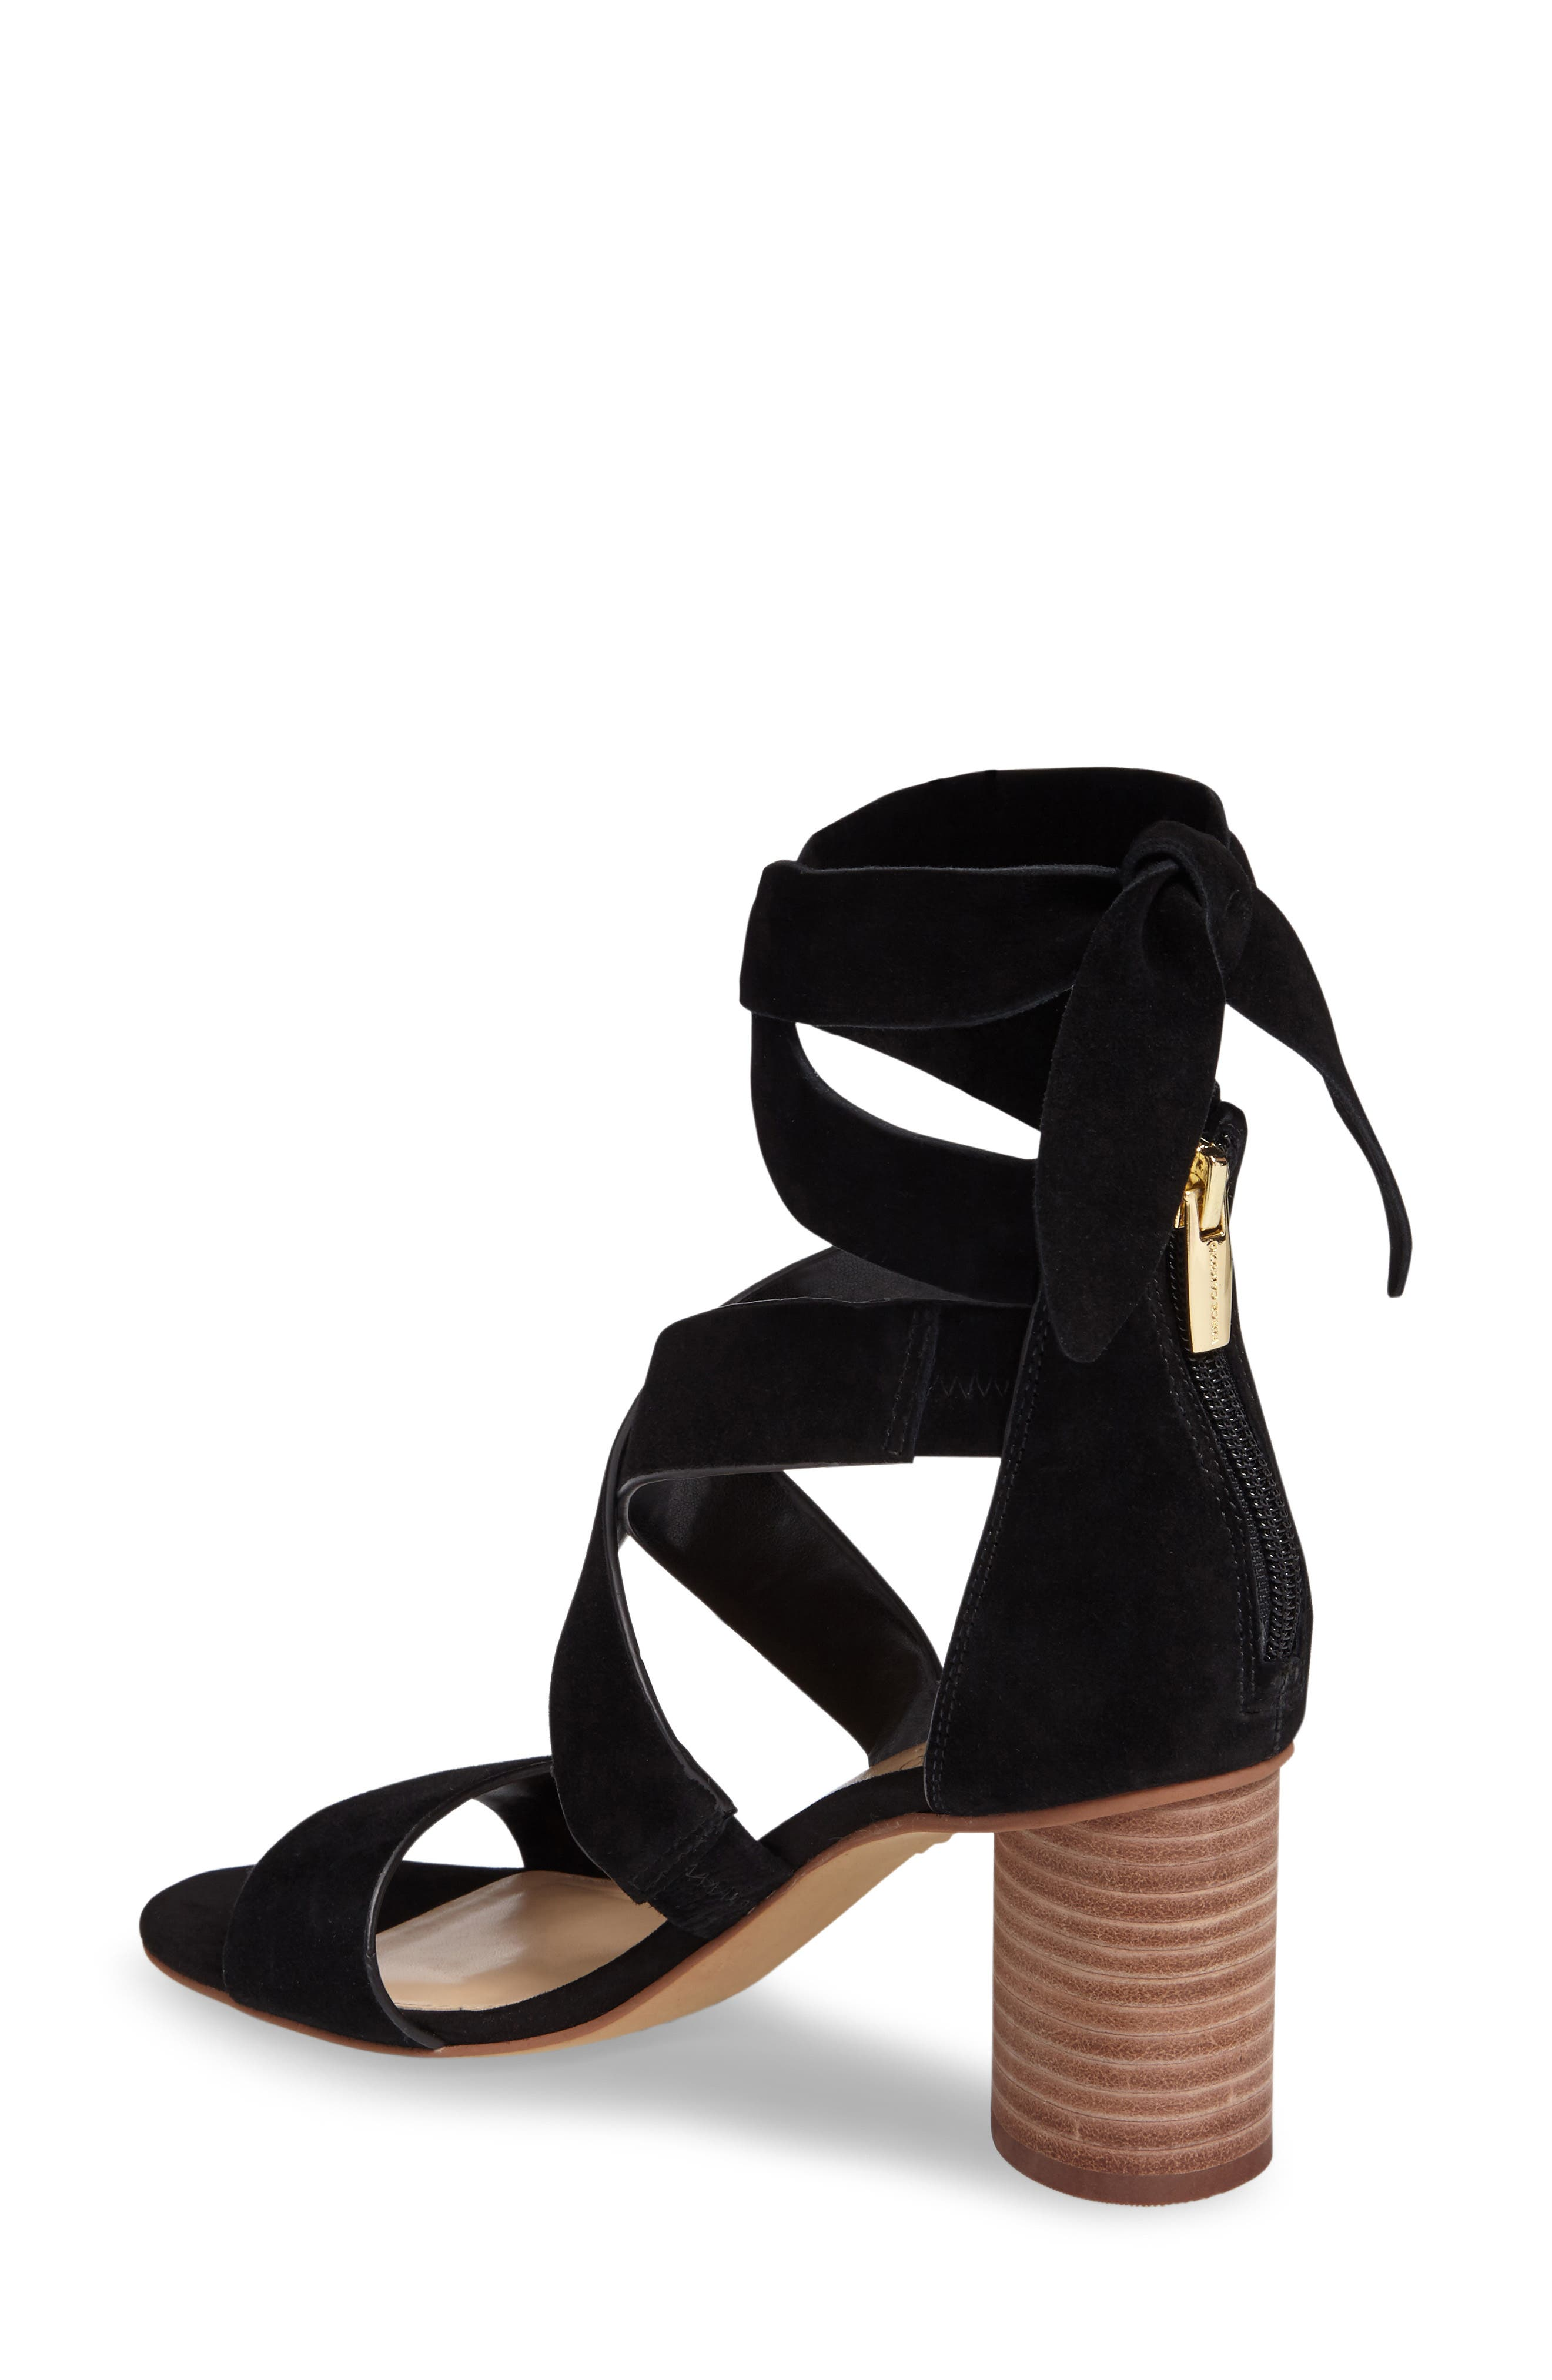 Jeneve Block Heel Sandal,                             Alternate thumbnail 2, color,                             001